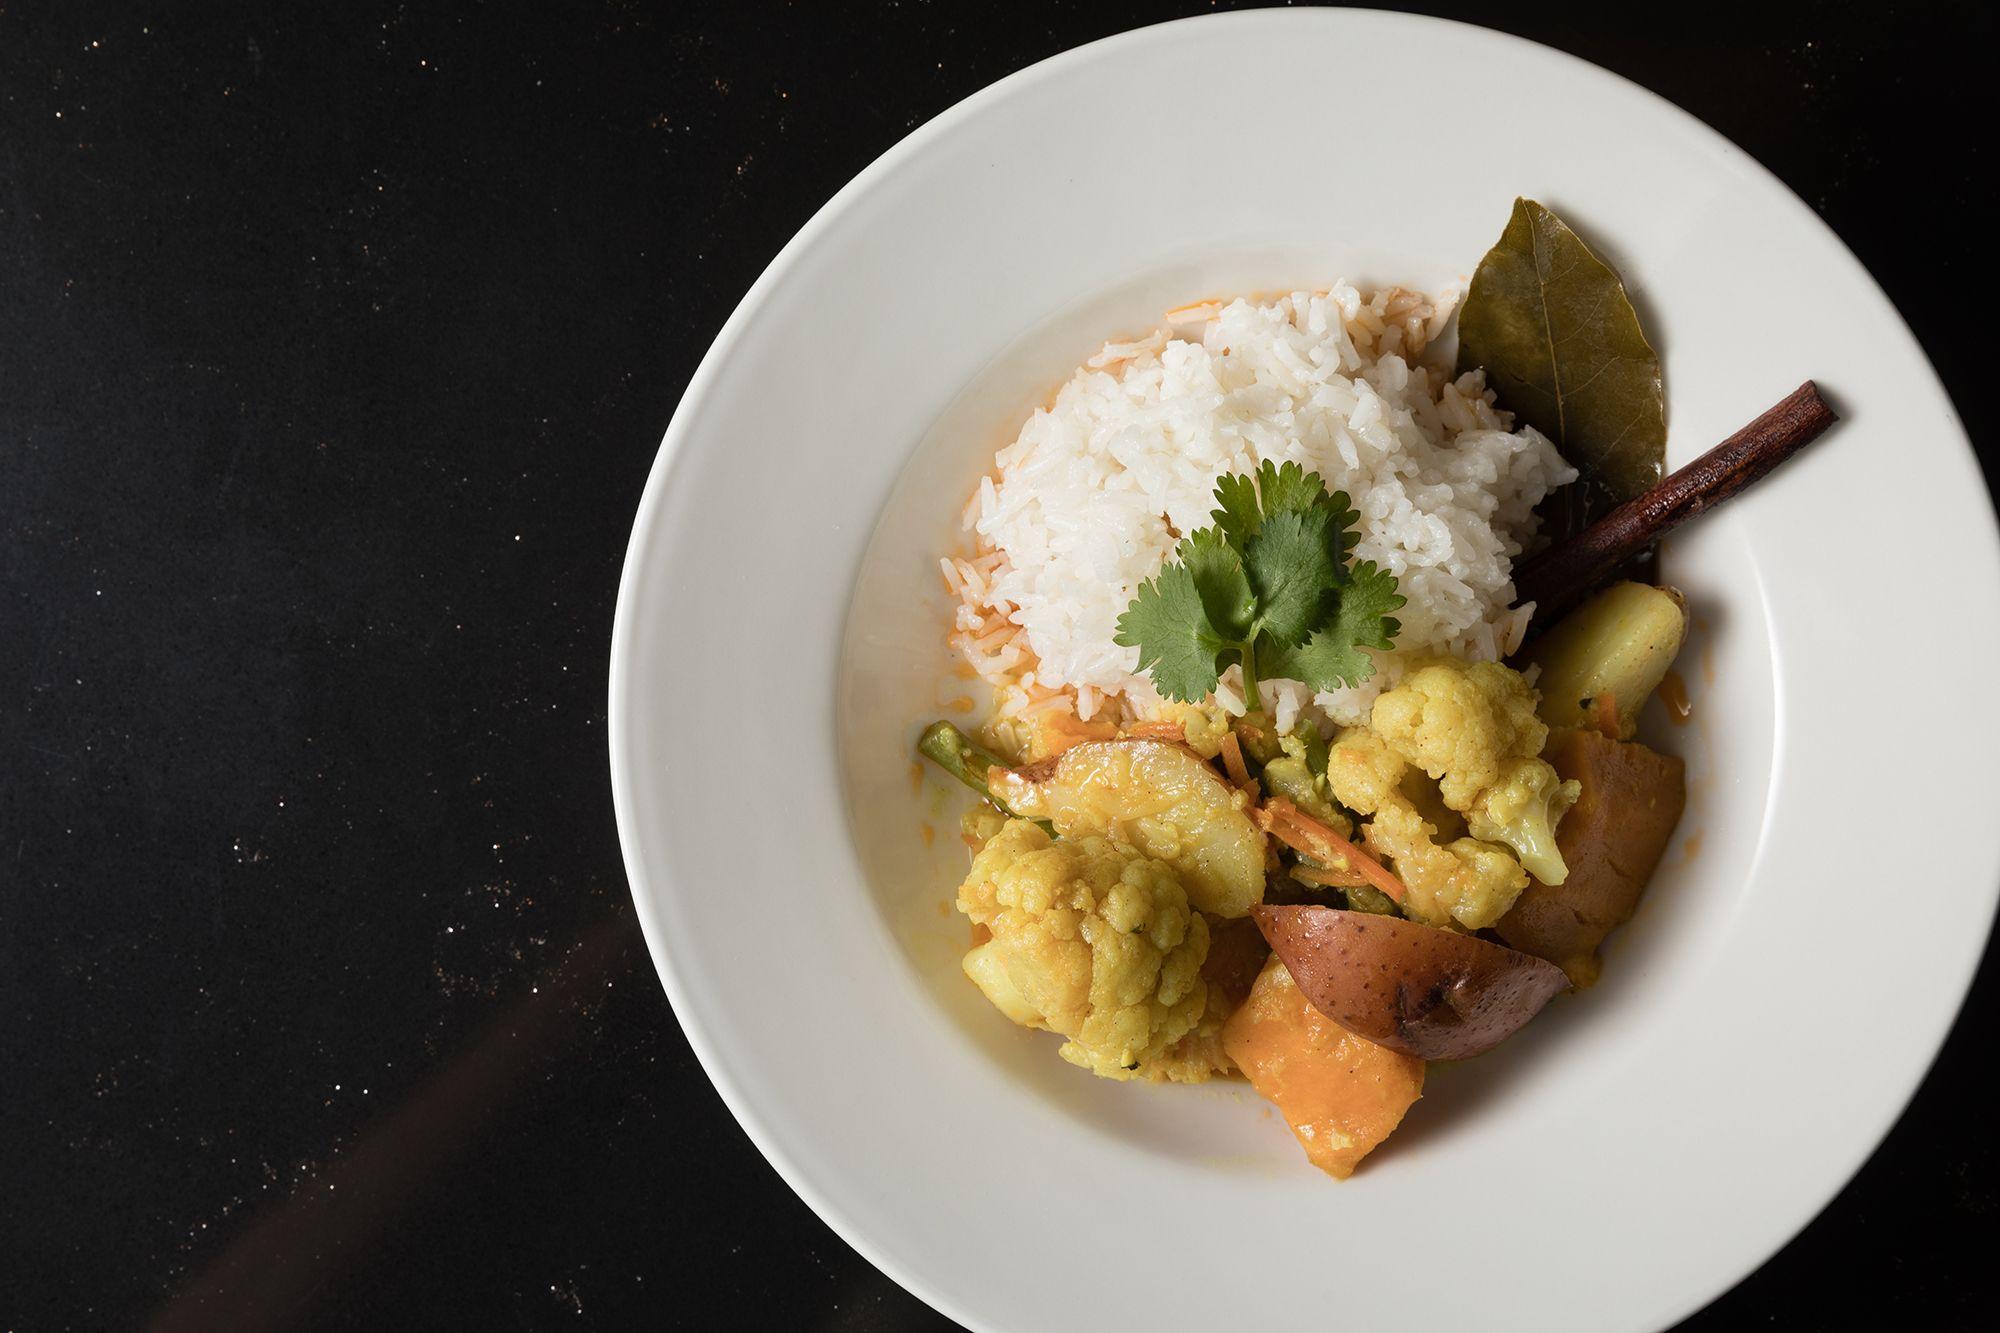 A bowl of Thai curry.